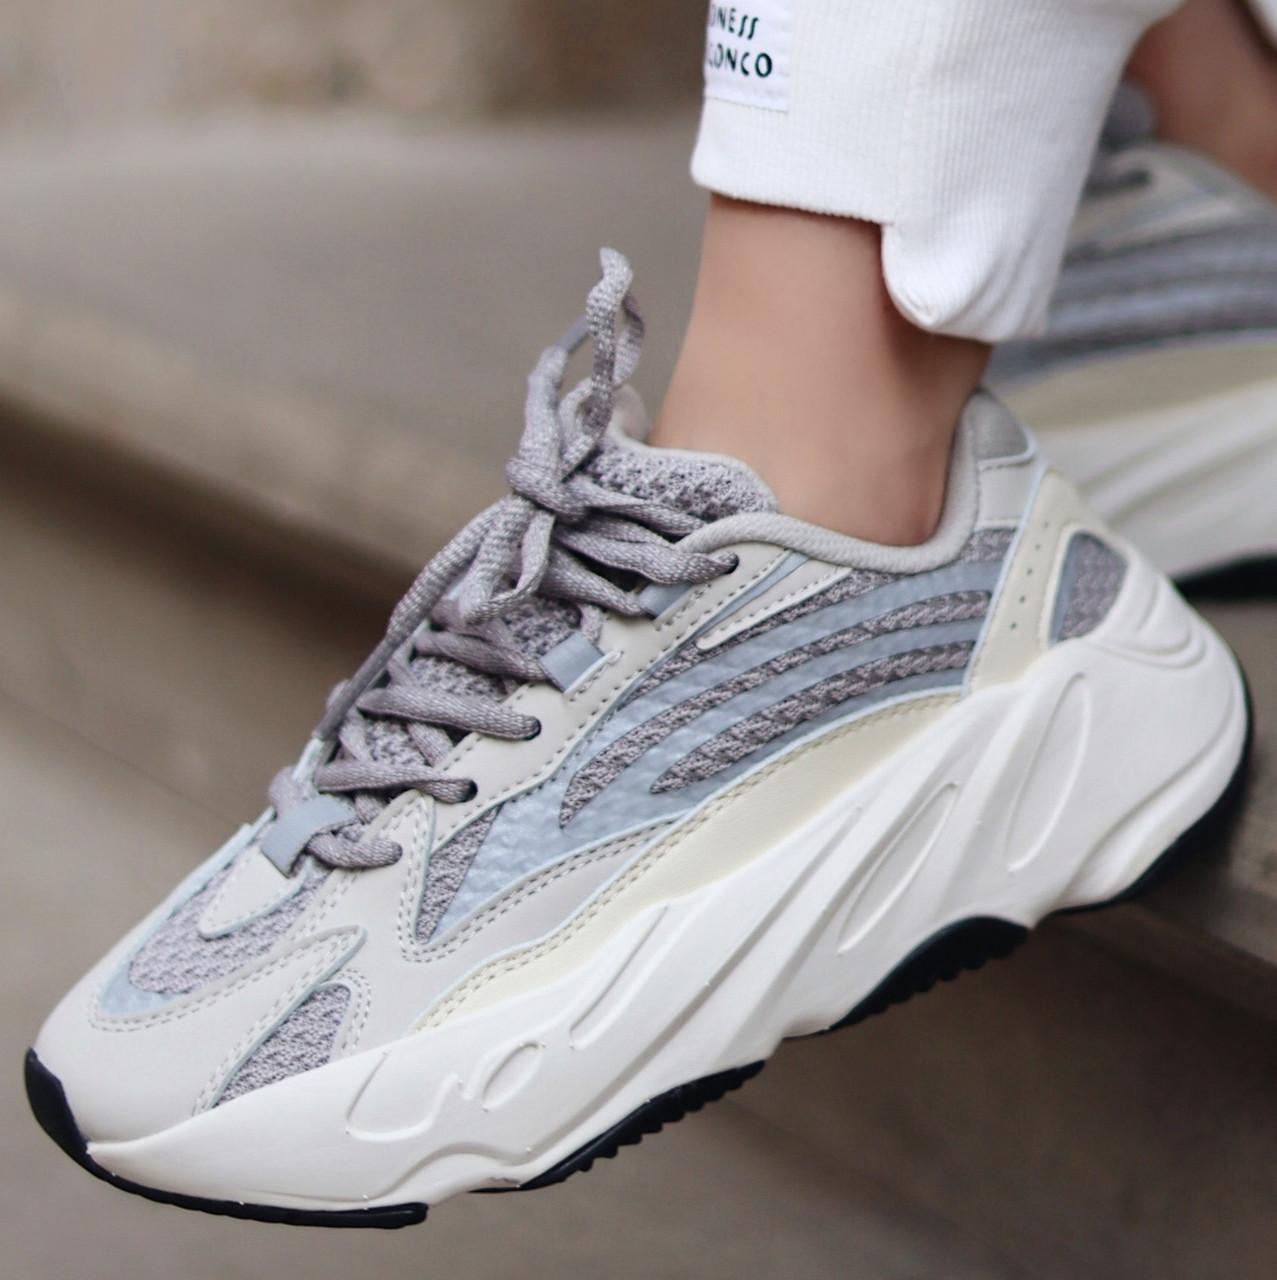 brand new 2e2f0 de695 Женские и мужские кроссовки Adidas Yeezy Wave Runner Boost 700 V2 Static 37  - Bigl.ua